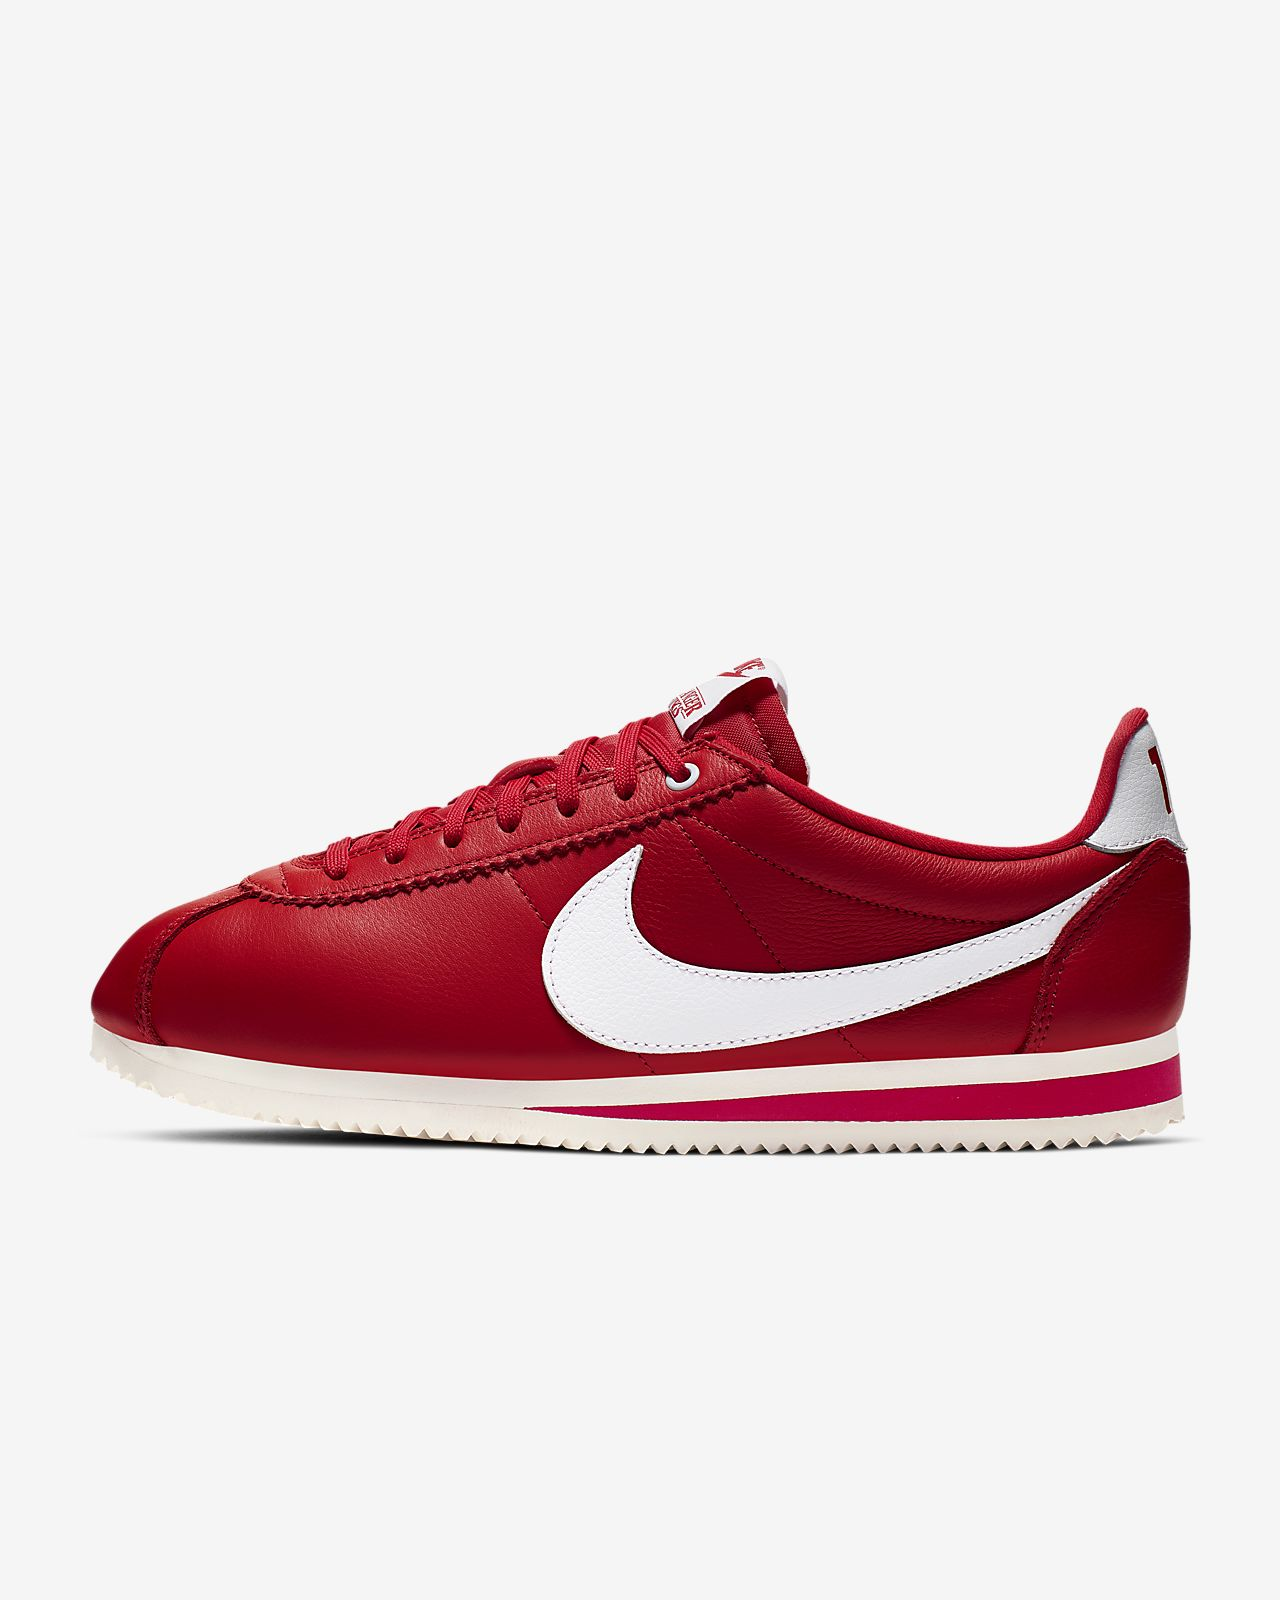 Nike Classic Cortez QS ST男子运动鞋